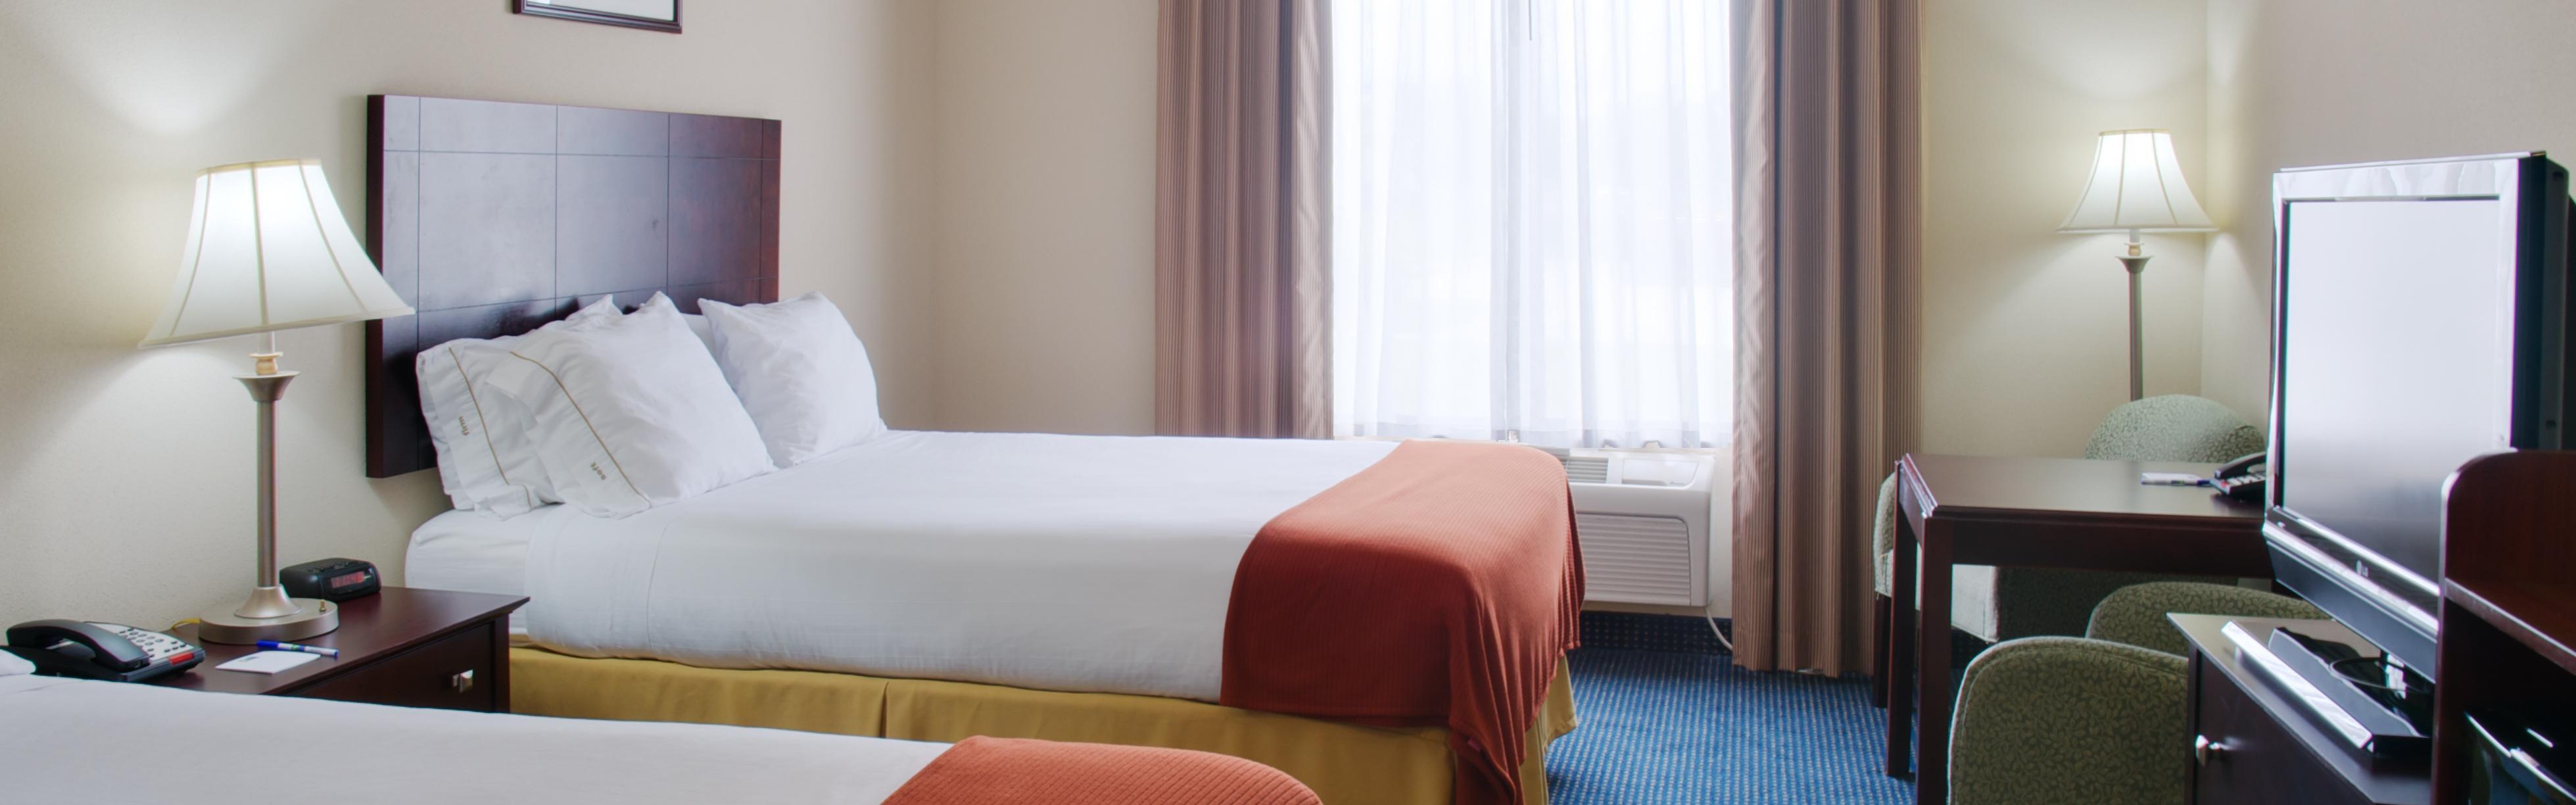 Holiday Inn Express Orange image 1